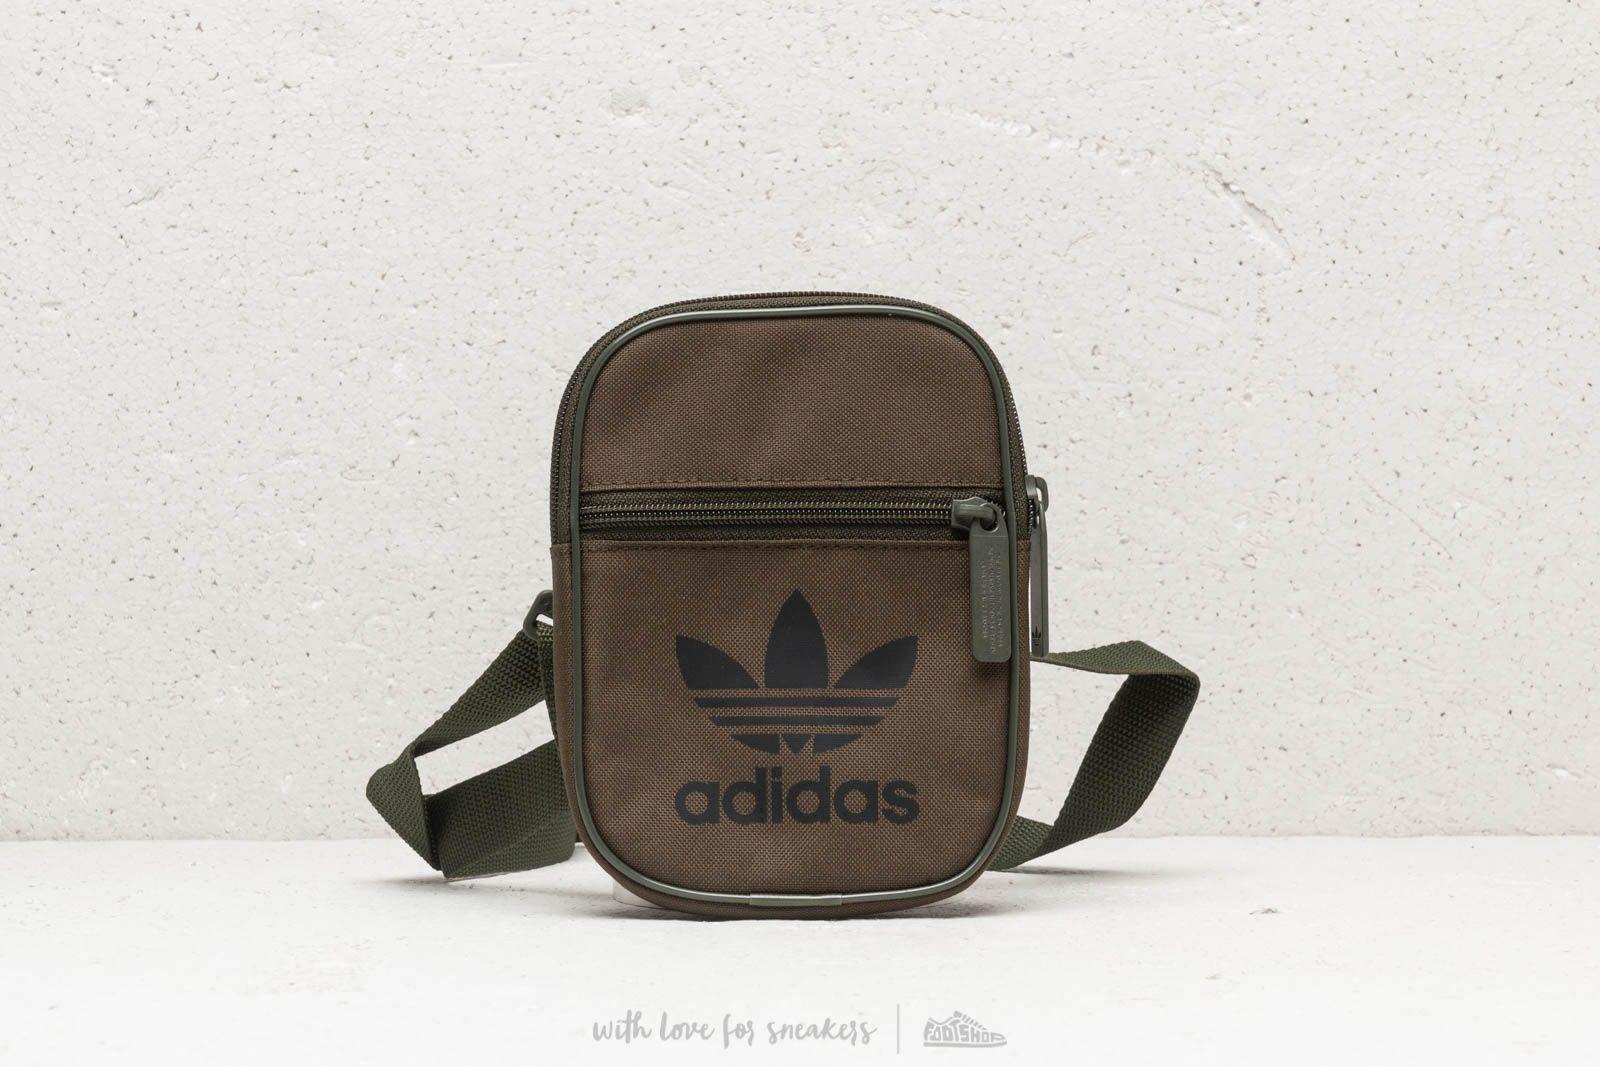 bfa40fe82a76 adidas Trefoil Festival Bag Night Cargo at a great price 17 € buy at  Footshop